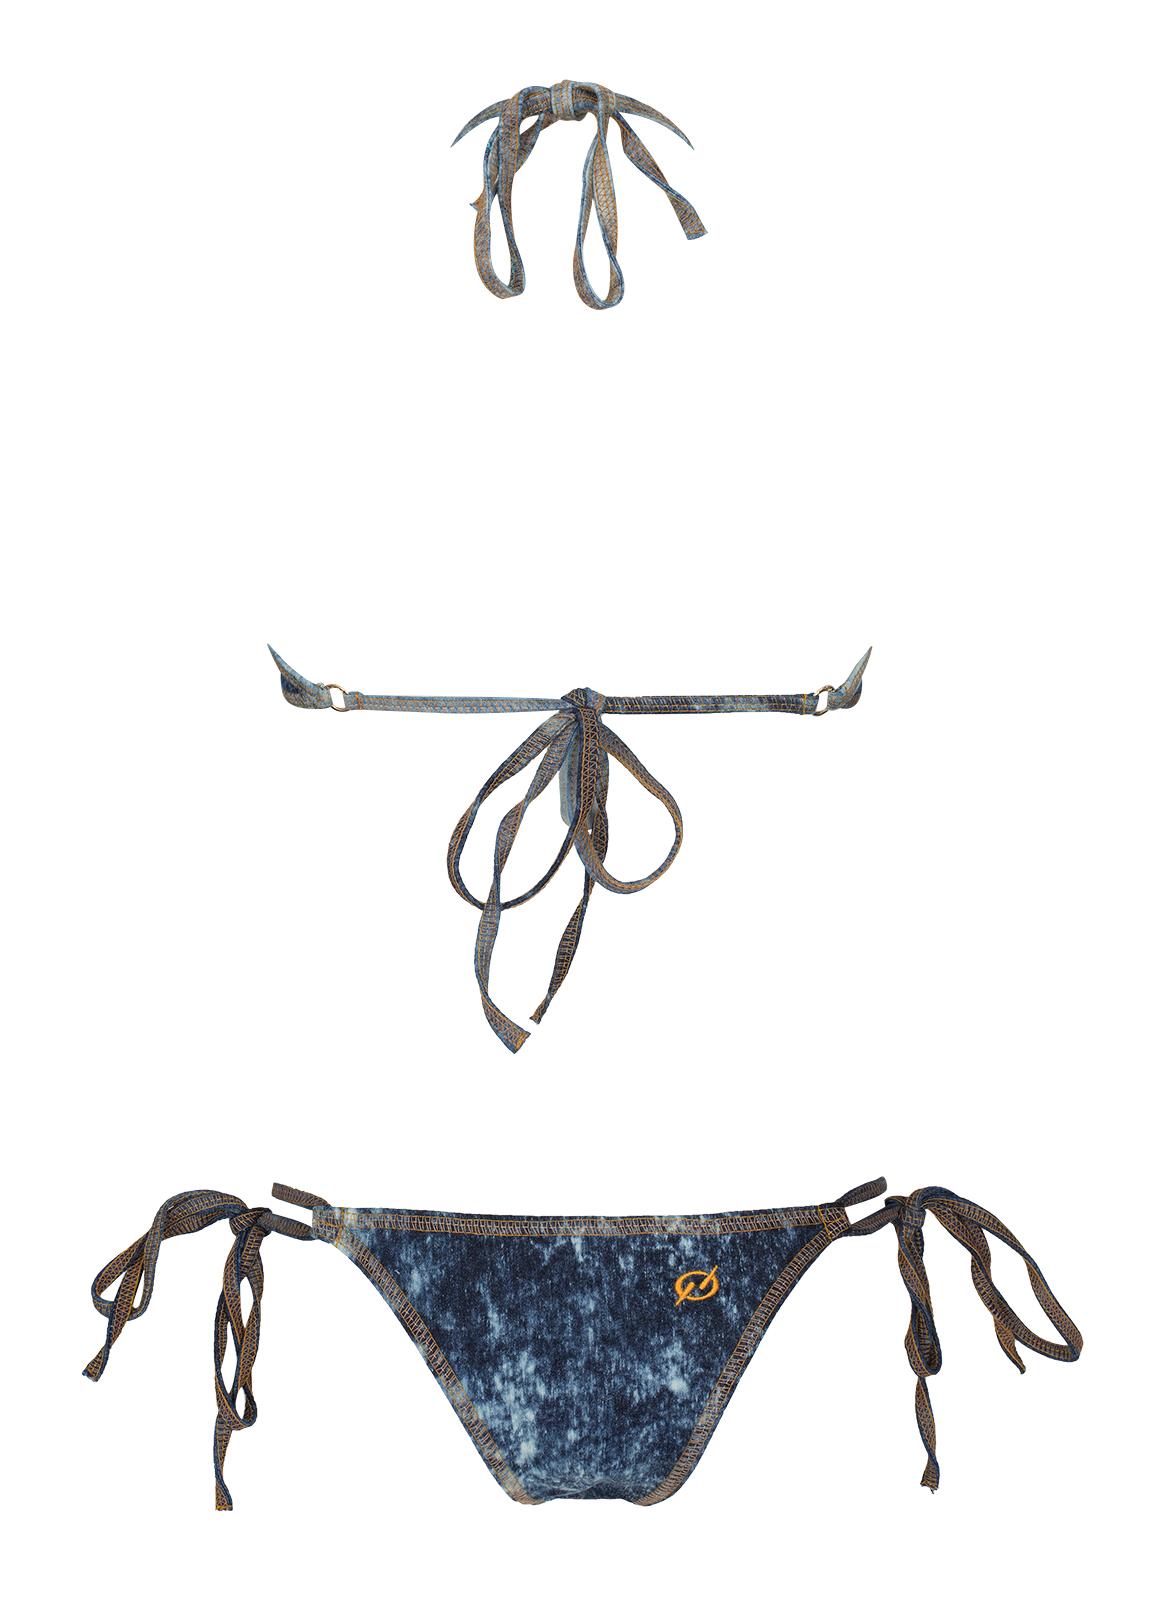 Bañadores Trikini Jeans Con Lazos Y Costuras Naranja - Fenix Jeans